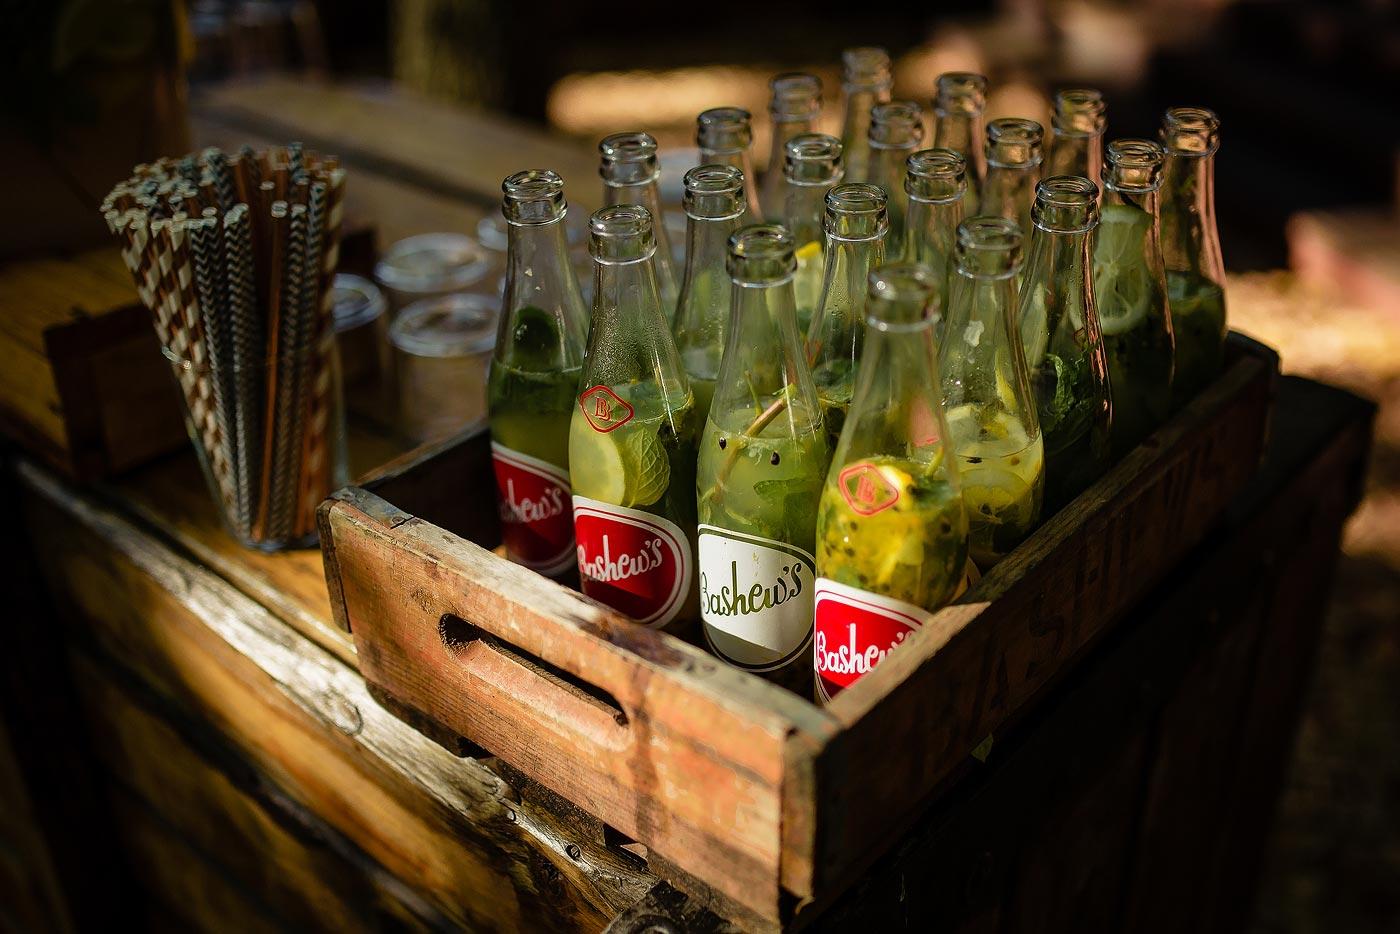 Wedding Pre-drinks in glass bottles